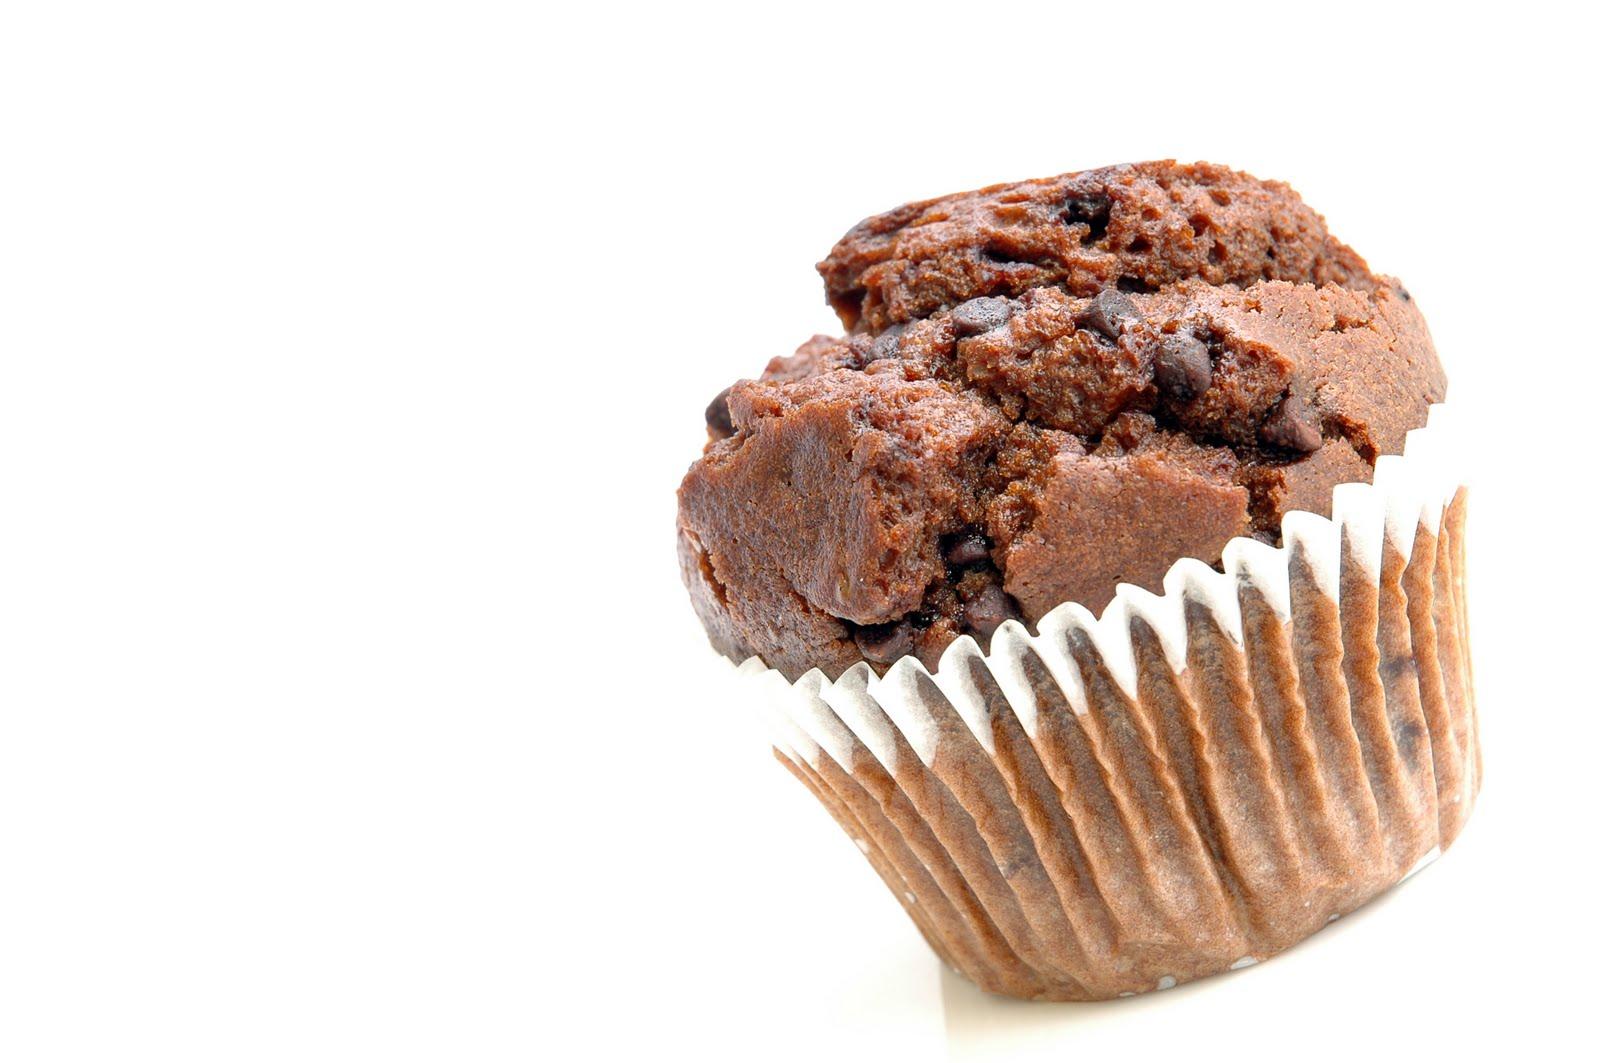 Yummy Chocolate Muffins | Wilde Style Eats